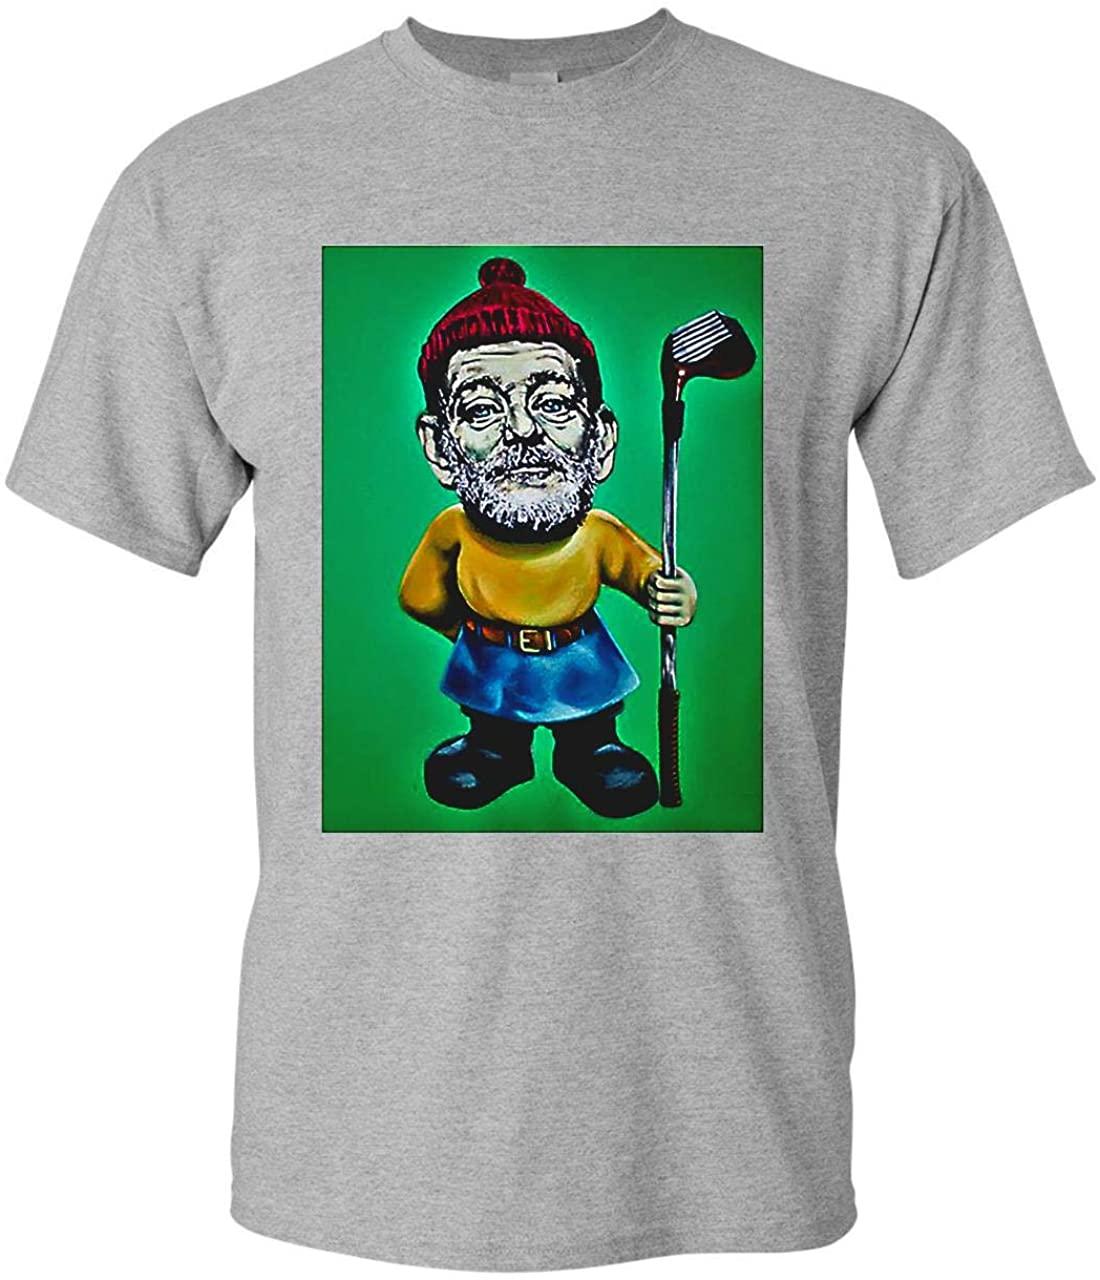 SAYOMEN - Bill Murray Golf Shirt T-Shirt Hoodie Long Sleeve Sweaters L1_05 T-Shirt Soft Warm Comfortablefor, Men Women, Christmas, Valentine